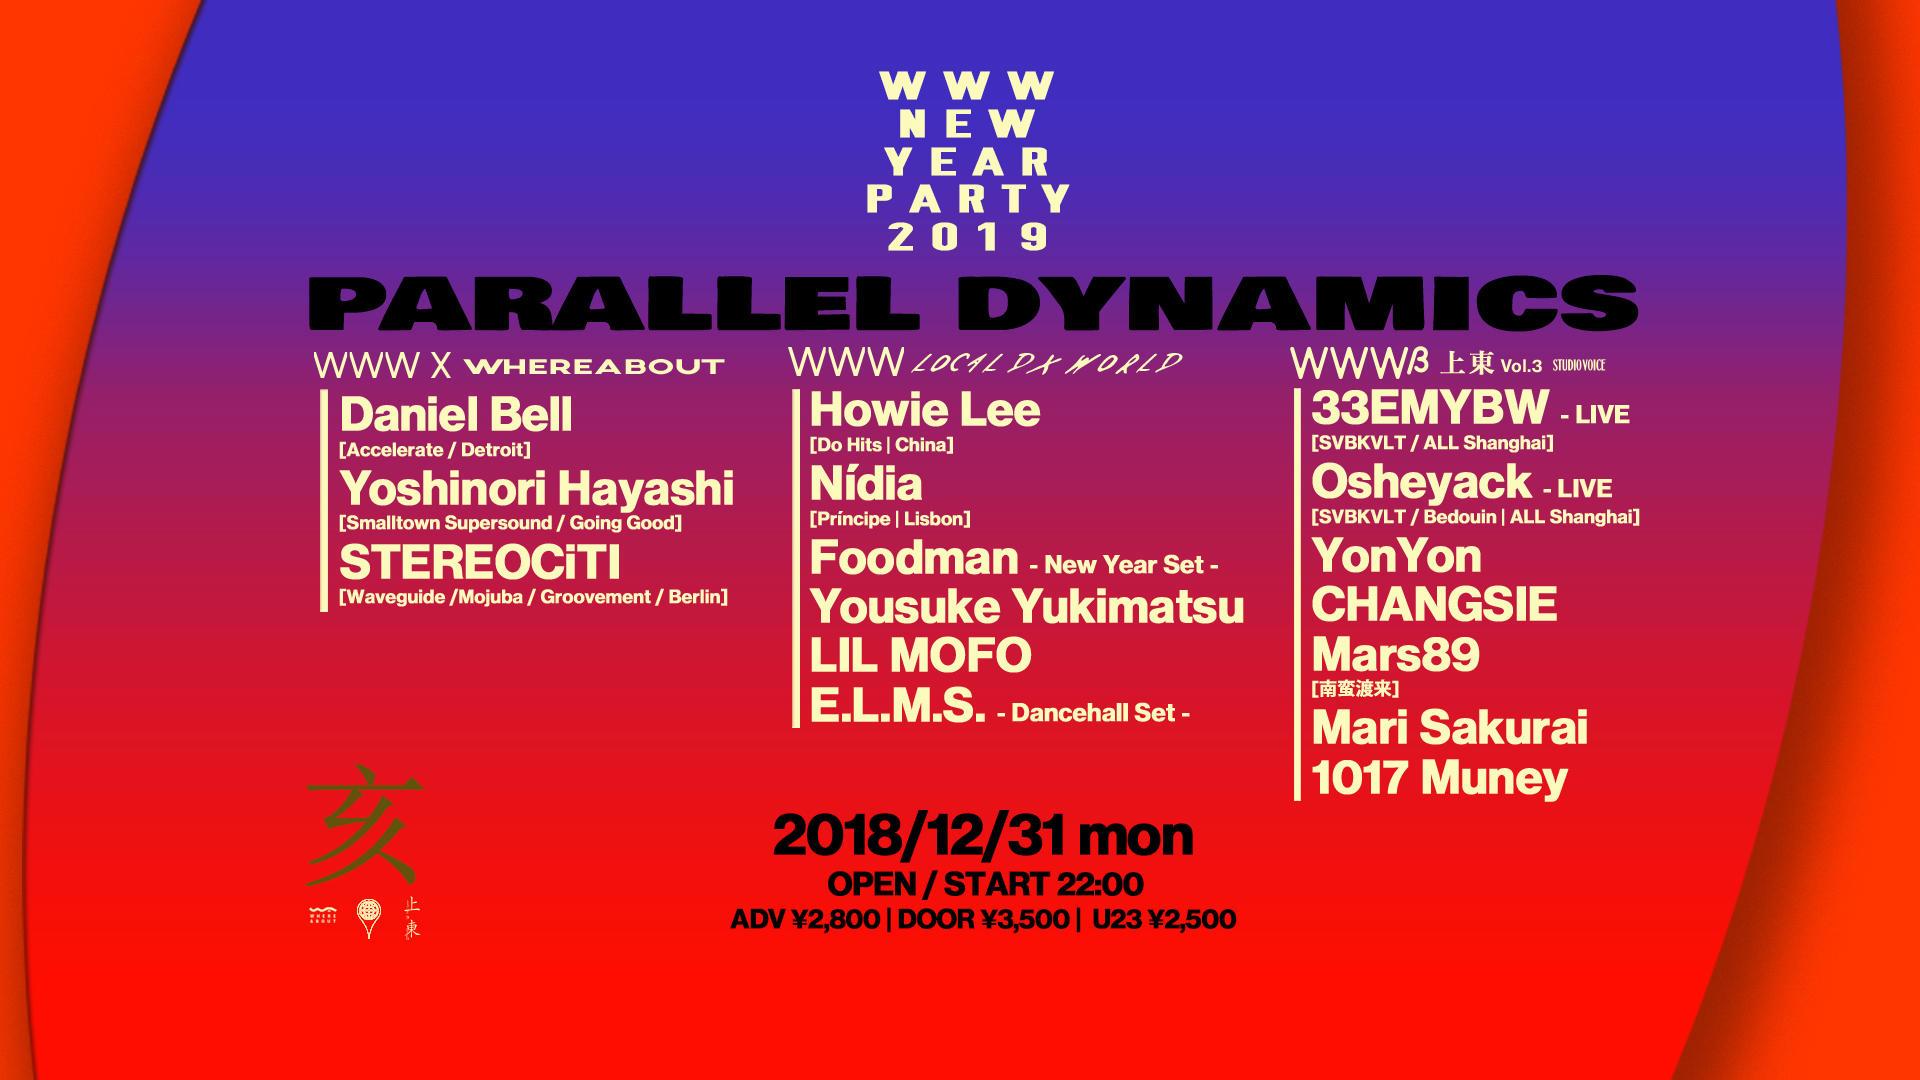 Daniel Bell / Yoshinori Hayashi / STEREOCiTI / Howie Lee / Nídia / Foodman / Yousuke Yukimatsu / LIL MOFO / E.L.M.S. / 33EMYBW / Osheyack / YonYon / CHANGSIE / Mars89 /  Mari Sakurai / 1017 Muney